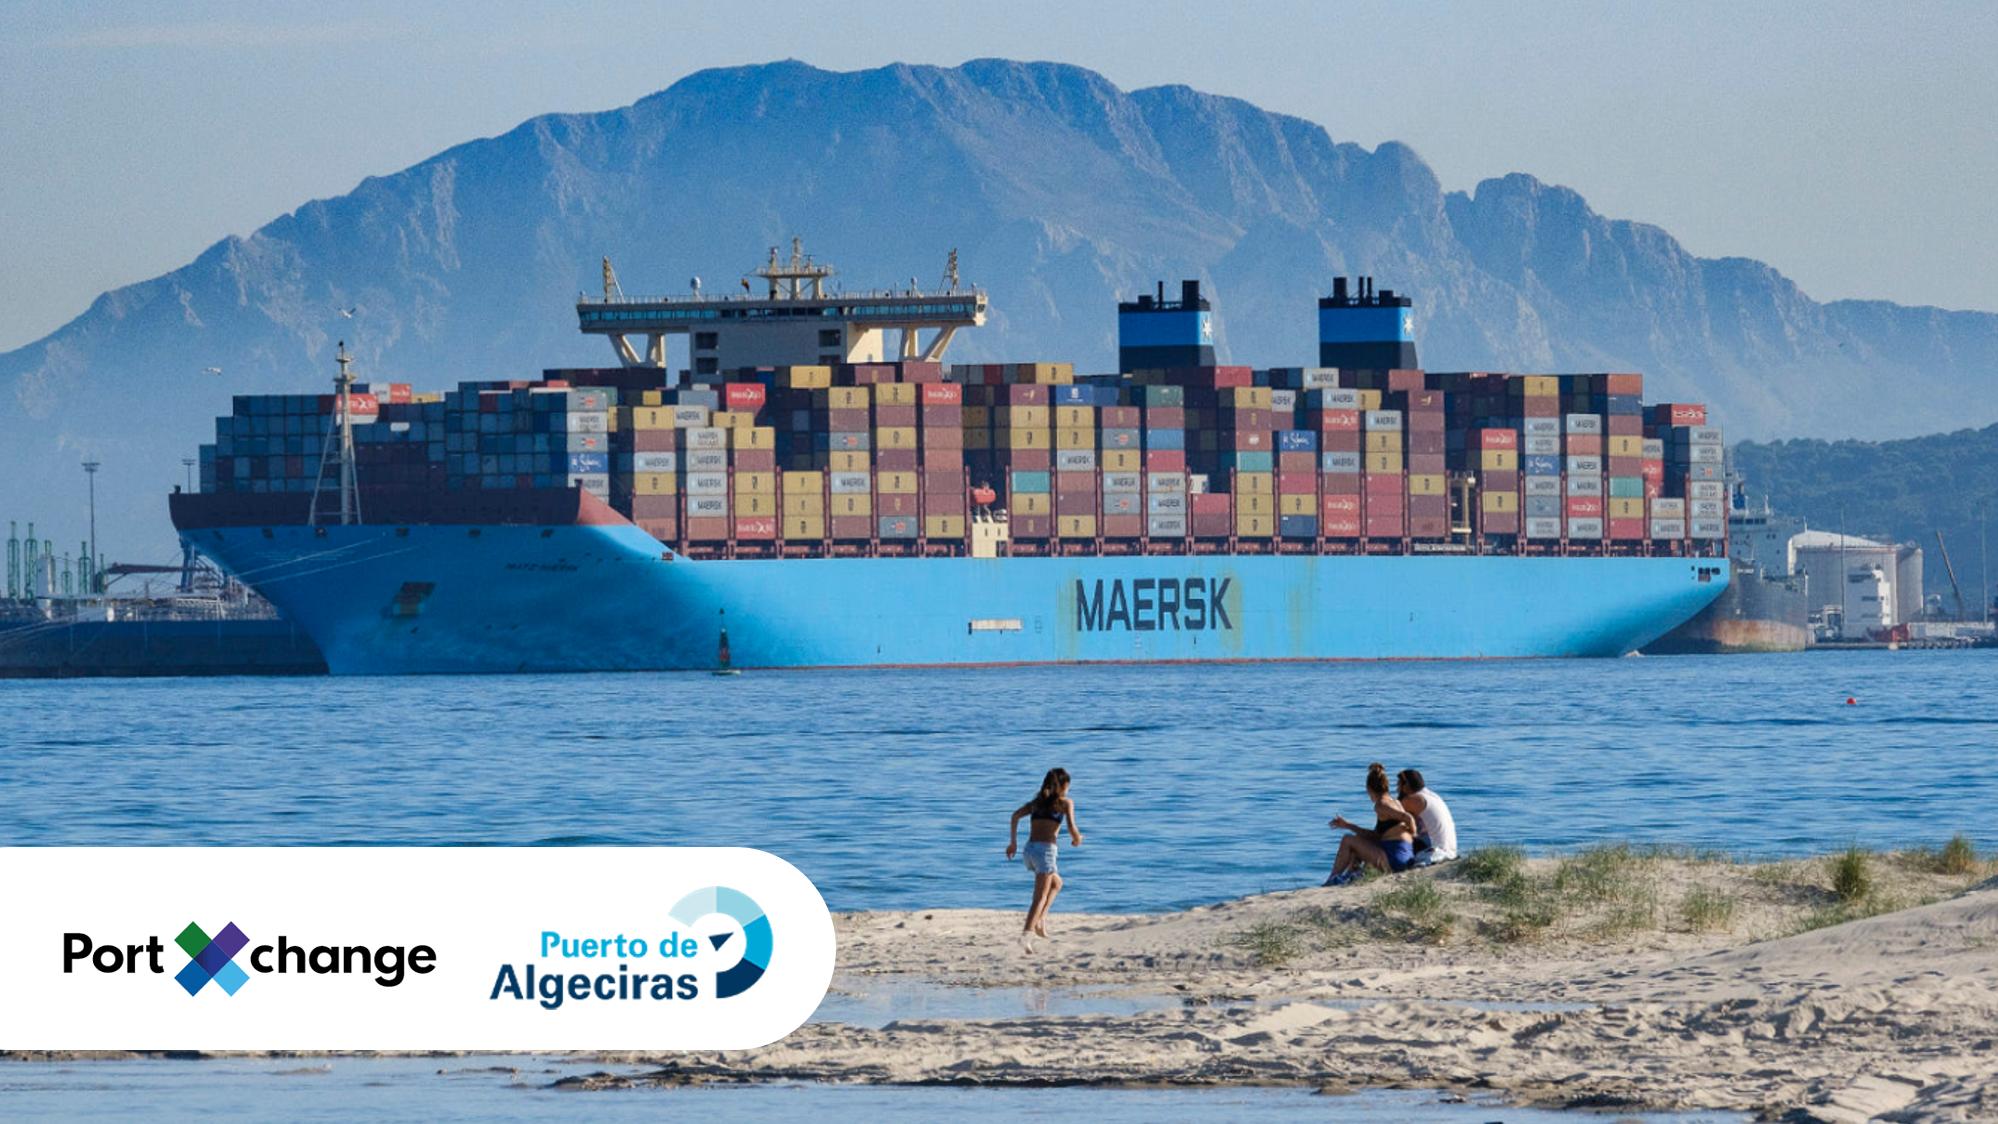 portxchange apba algeciras port innovation